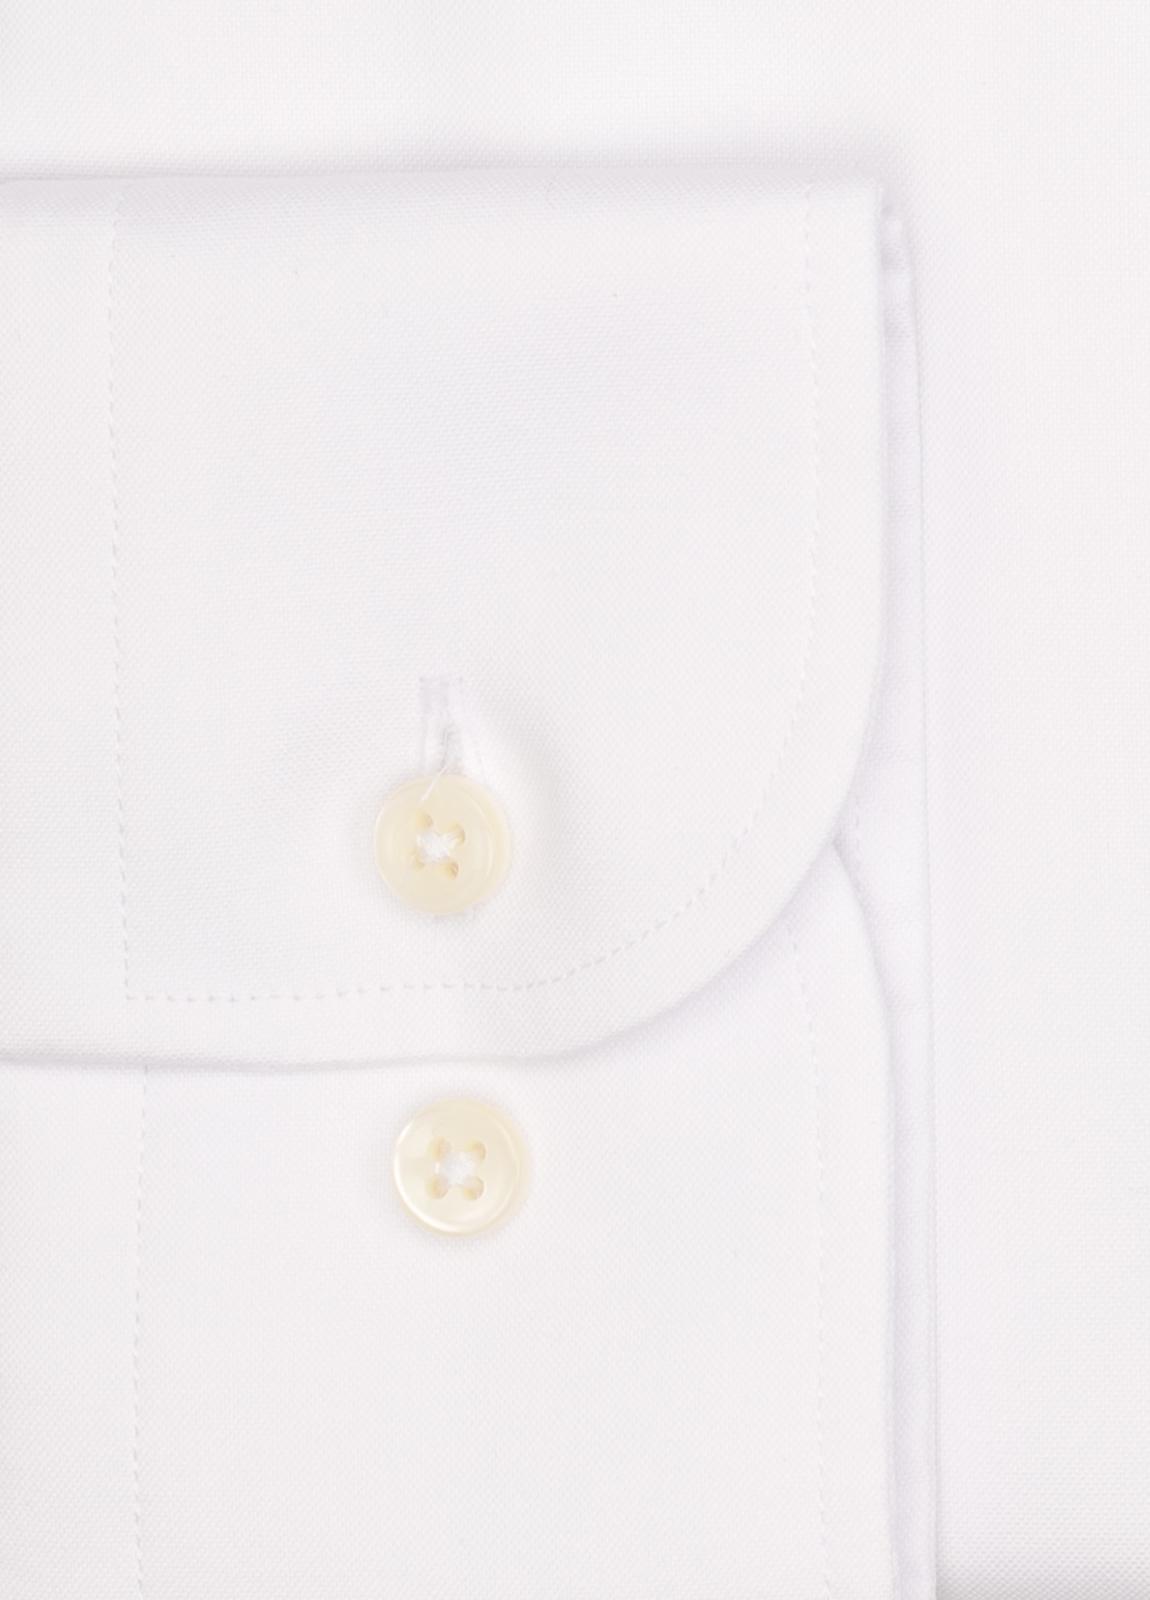 Camisa Formal Wear REGULAR FIT cuello italiano modelo TAILORED NAPOLI tejido color blanco, 100% Algodón. - Ítem1